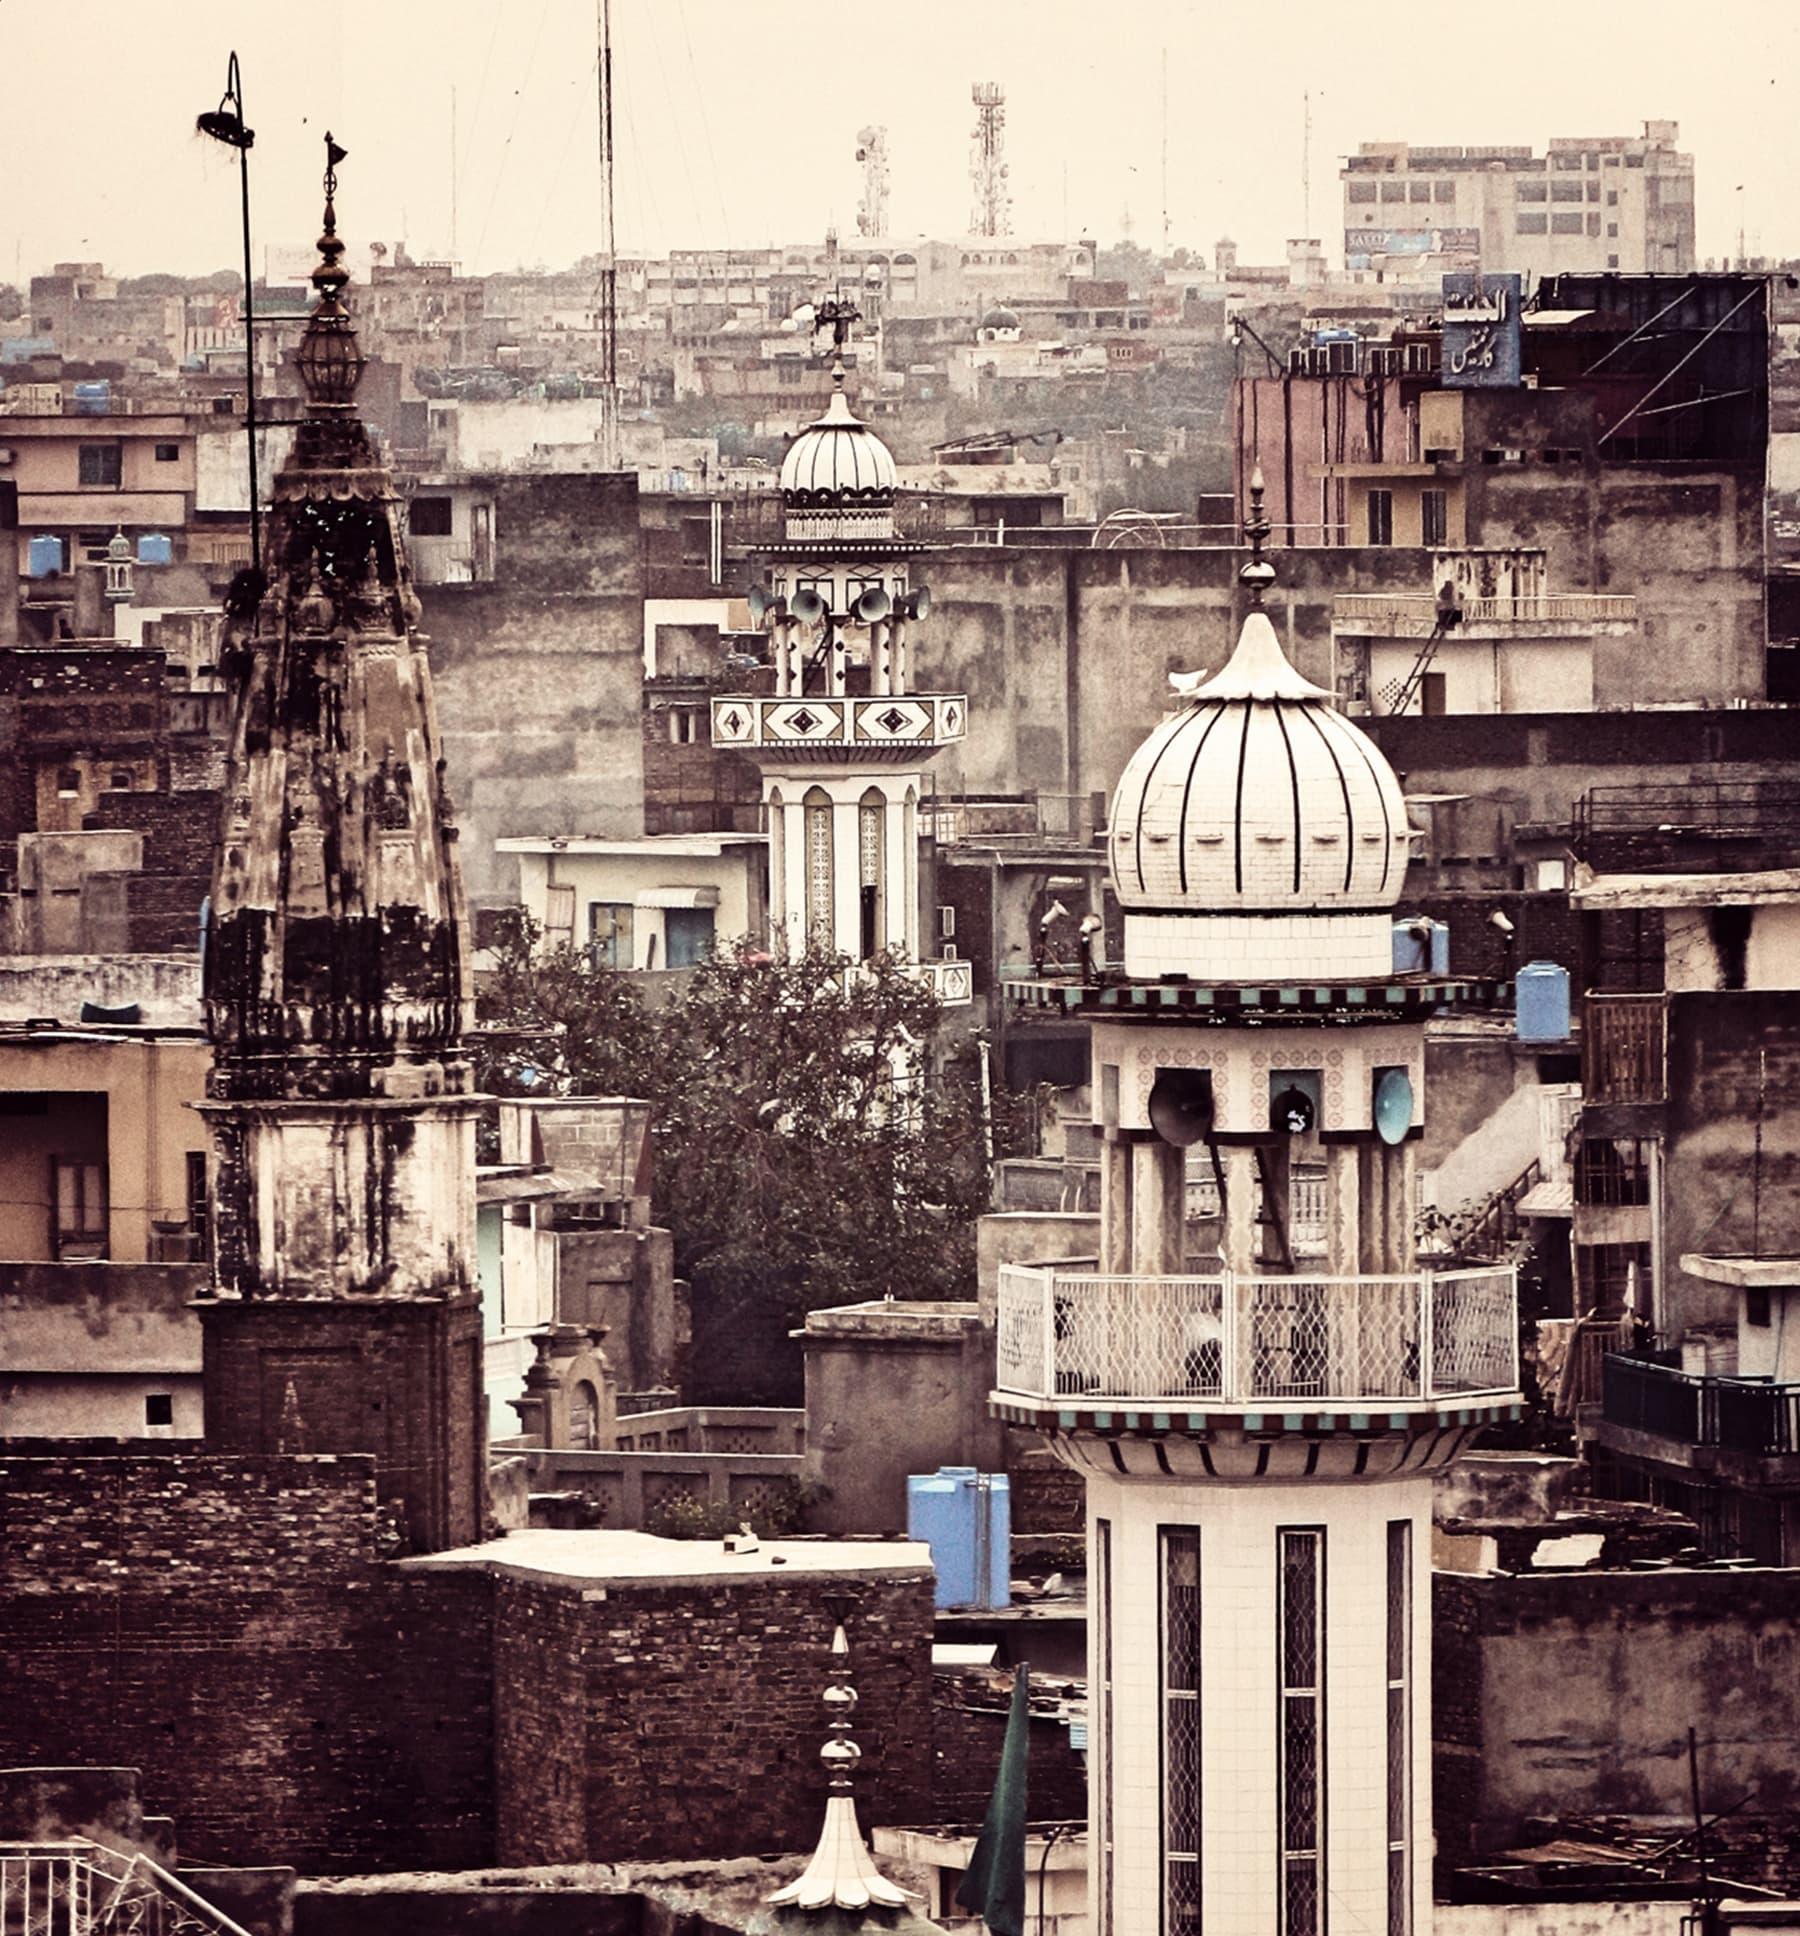 Mandir spire juxtaposed with Mosque Minar in the Bhabra bazaar neighbourhood of Old Rawalpindi.—Muhammad Bin Naveed